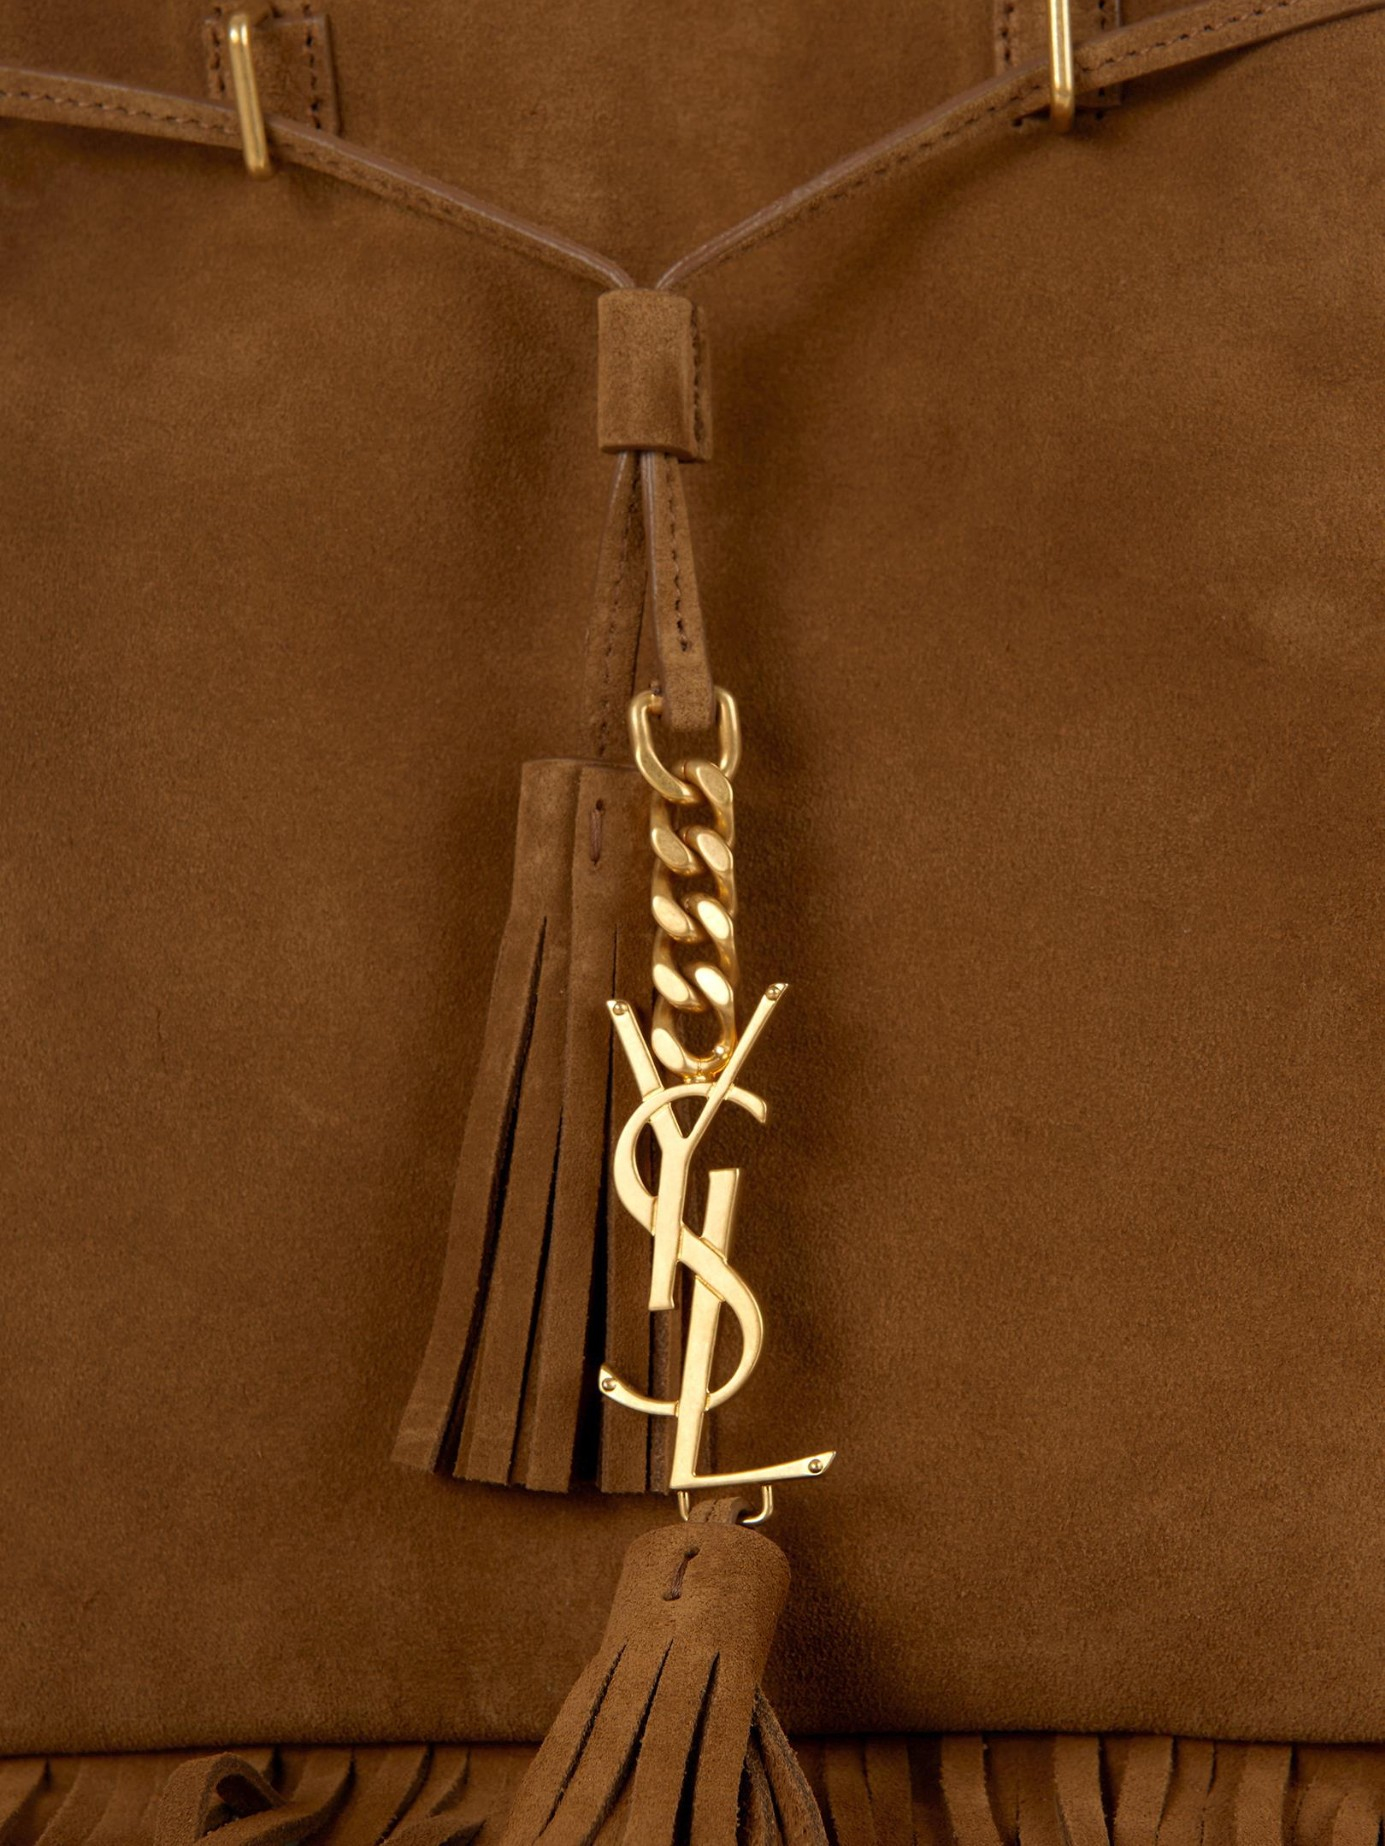 74305e9a1f Lyst - Saint Laurent Monogram Fringe Suede Bucket Bag in Brown